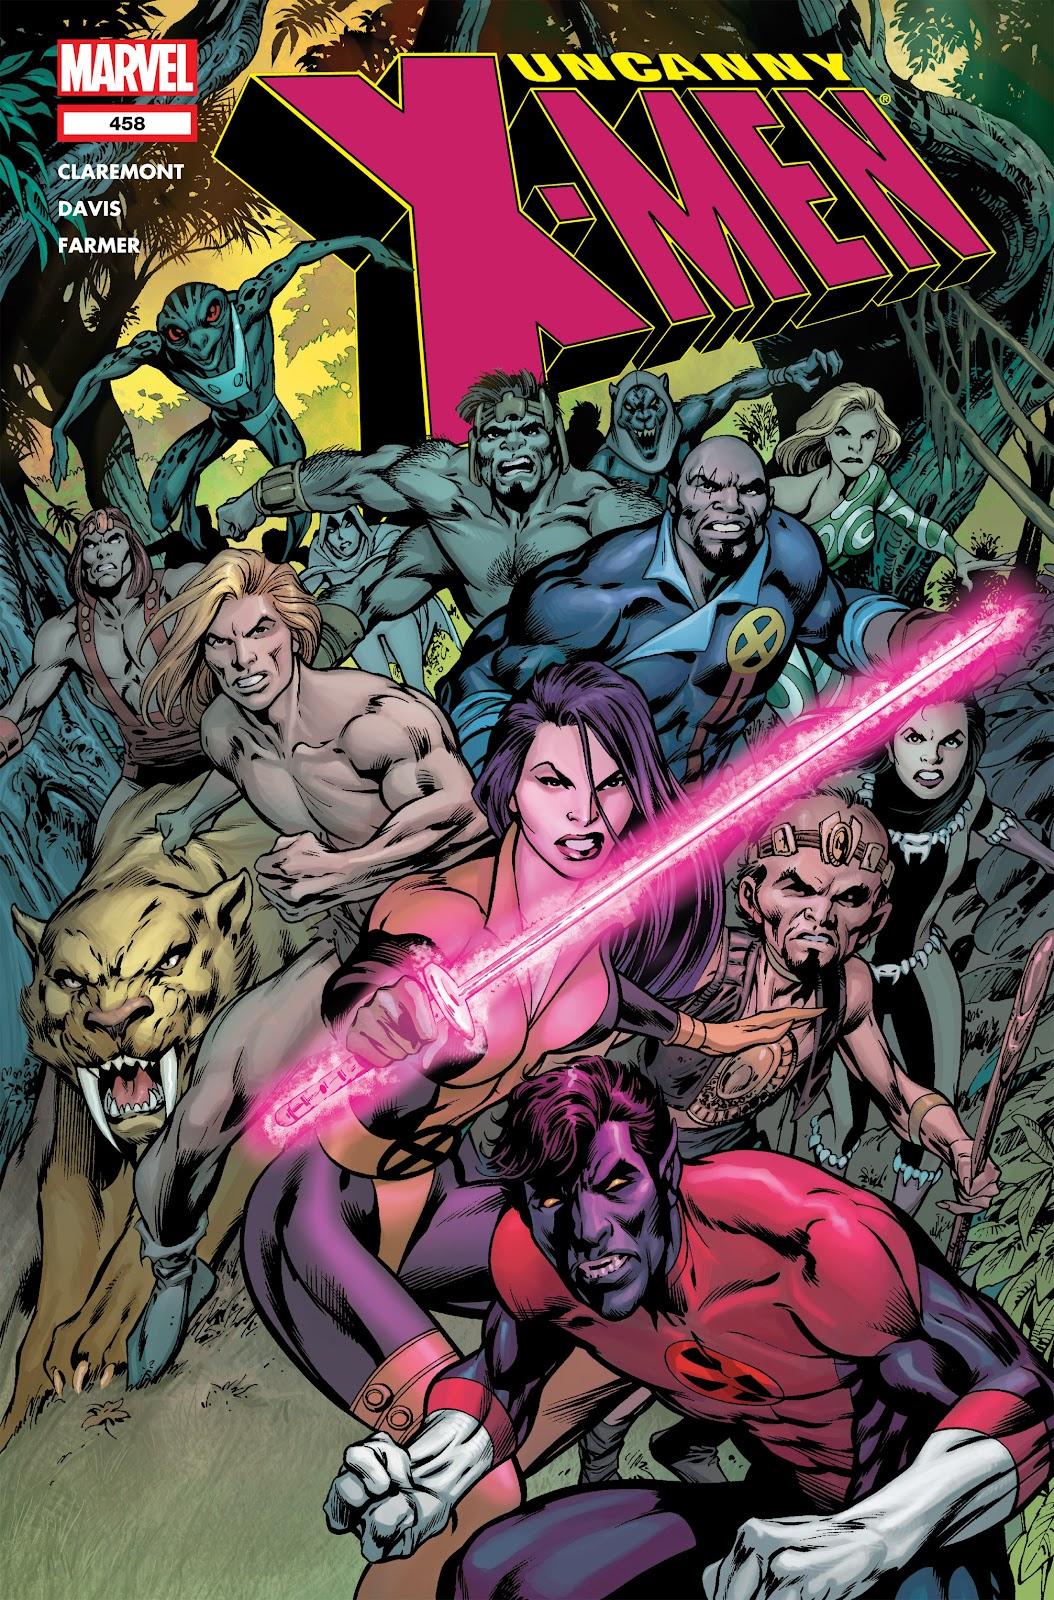 Uncanny X-Men (1963) issue 458 - Page 1